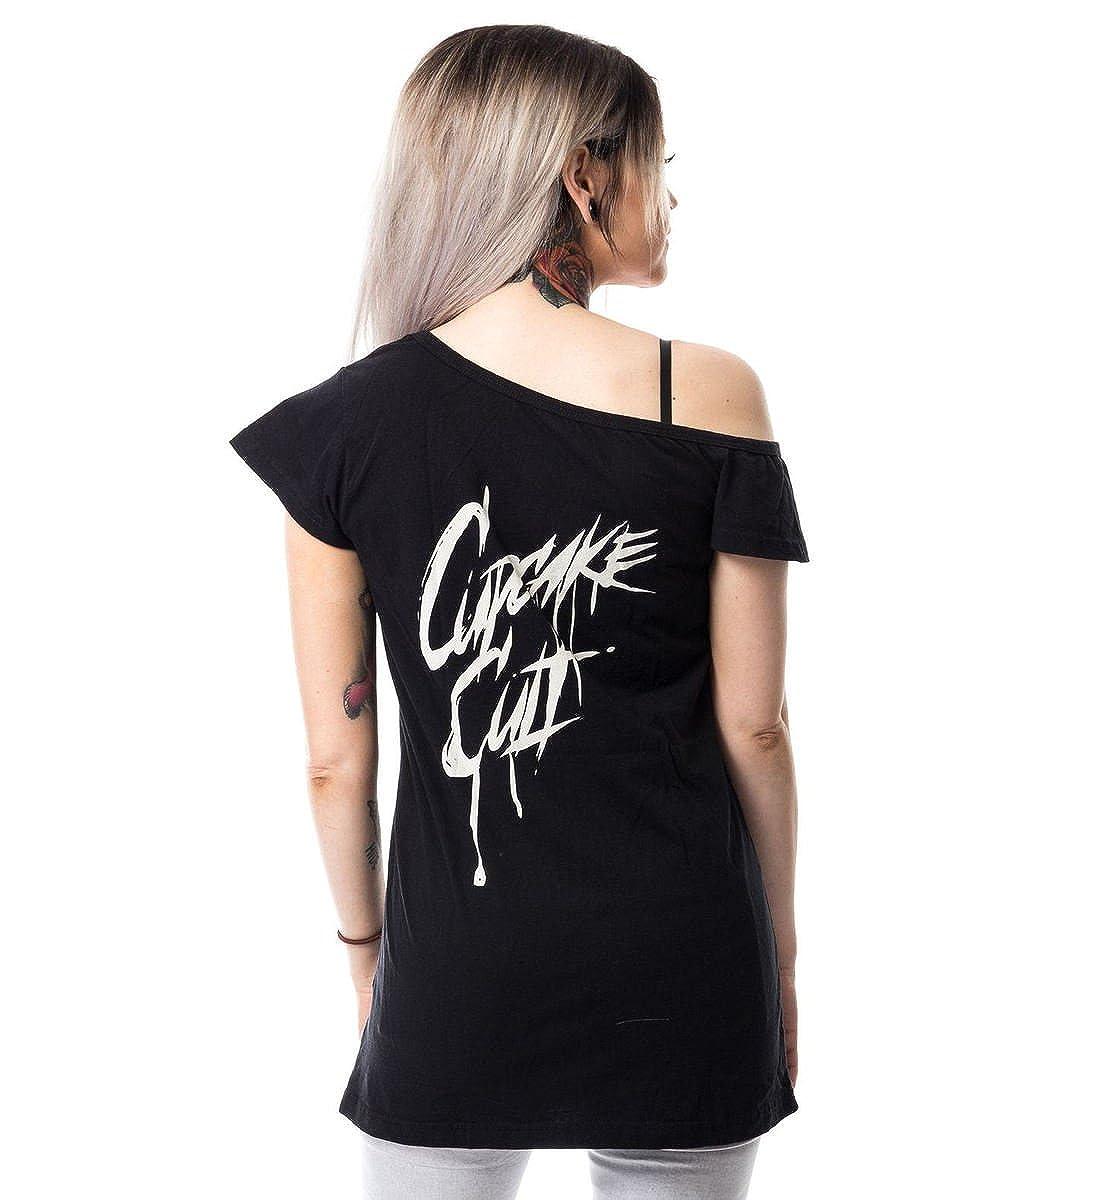 Cupcake Cult t-Shirt Dead Inside Off Shoulder T POI179